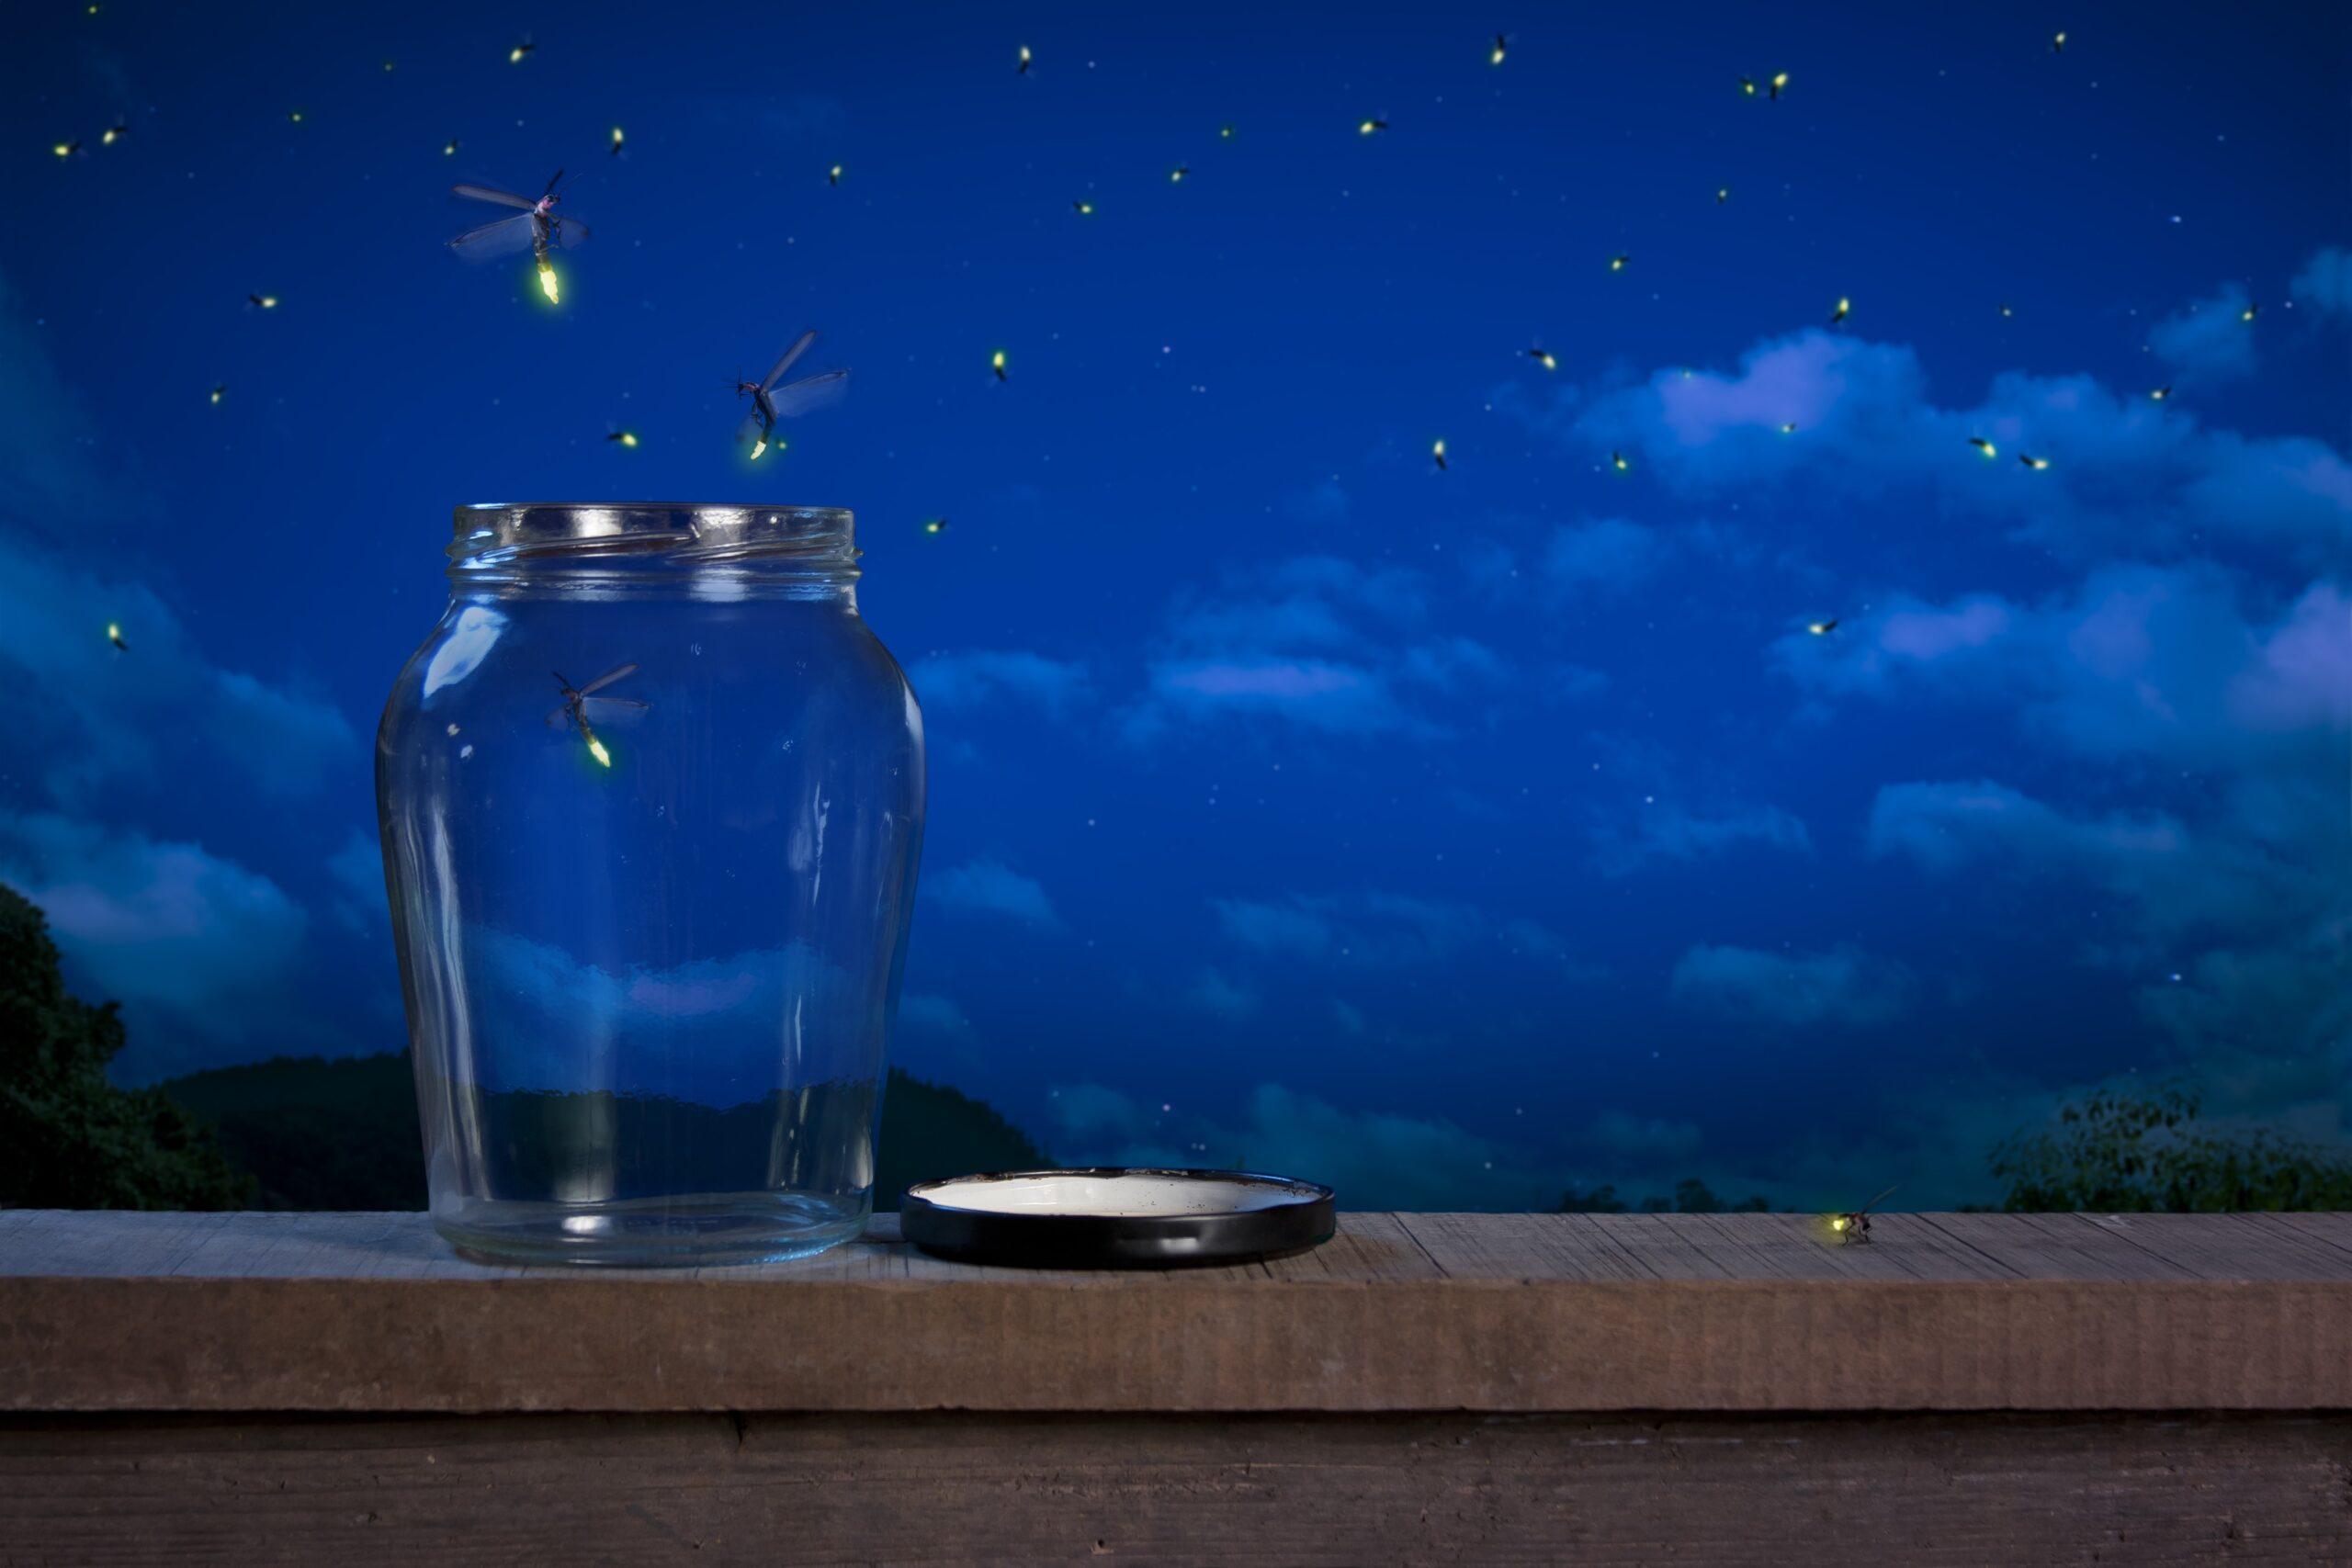 What diminishing lightening bugs show us